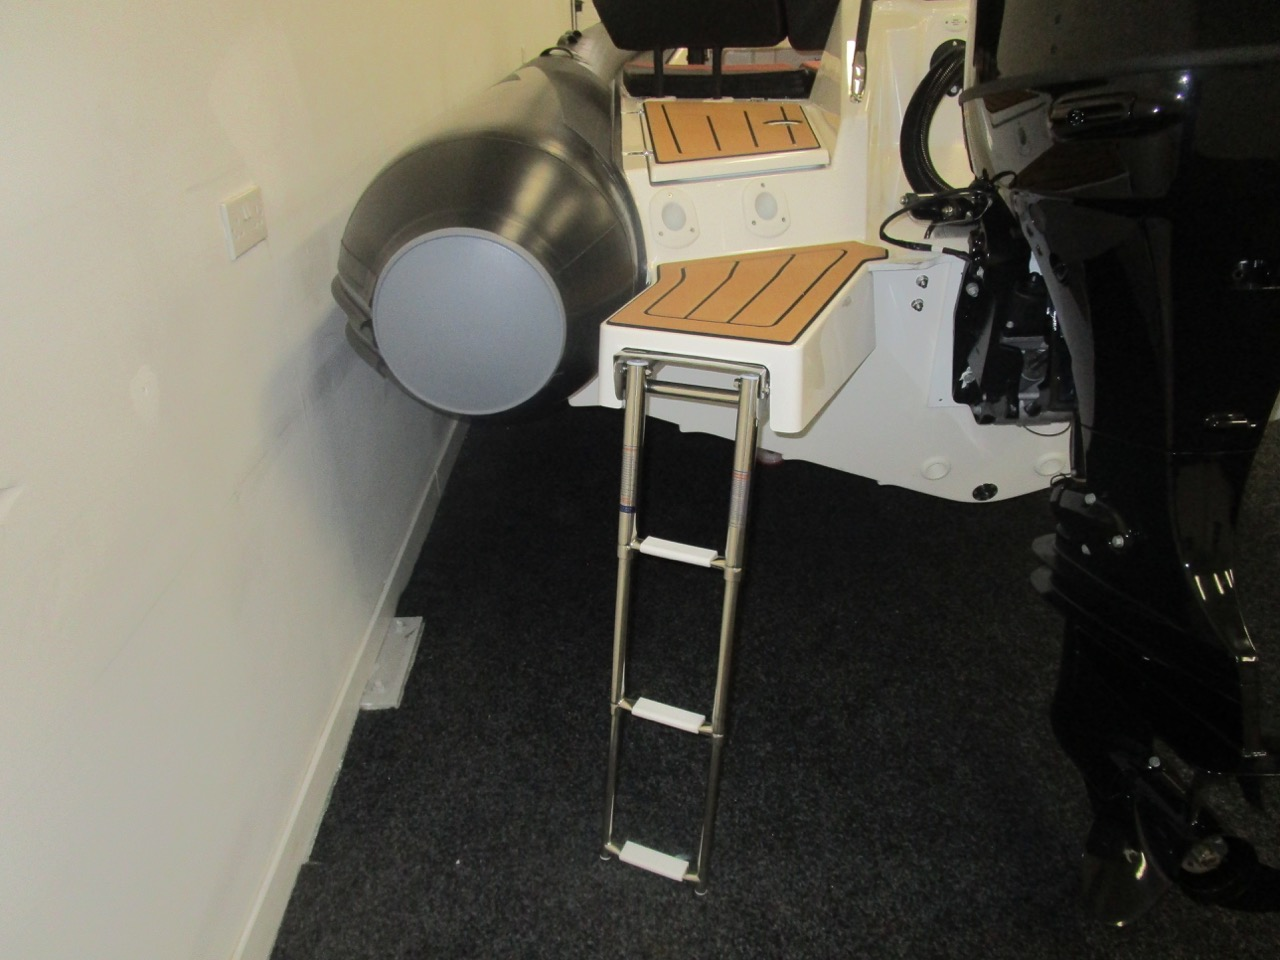 GRAND DRIVE D600 RIB bathing ladder down